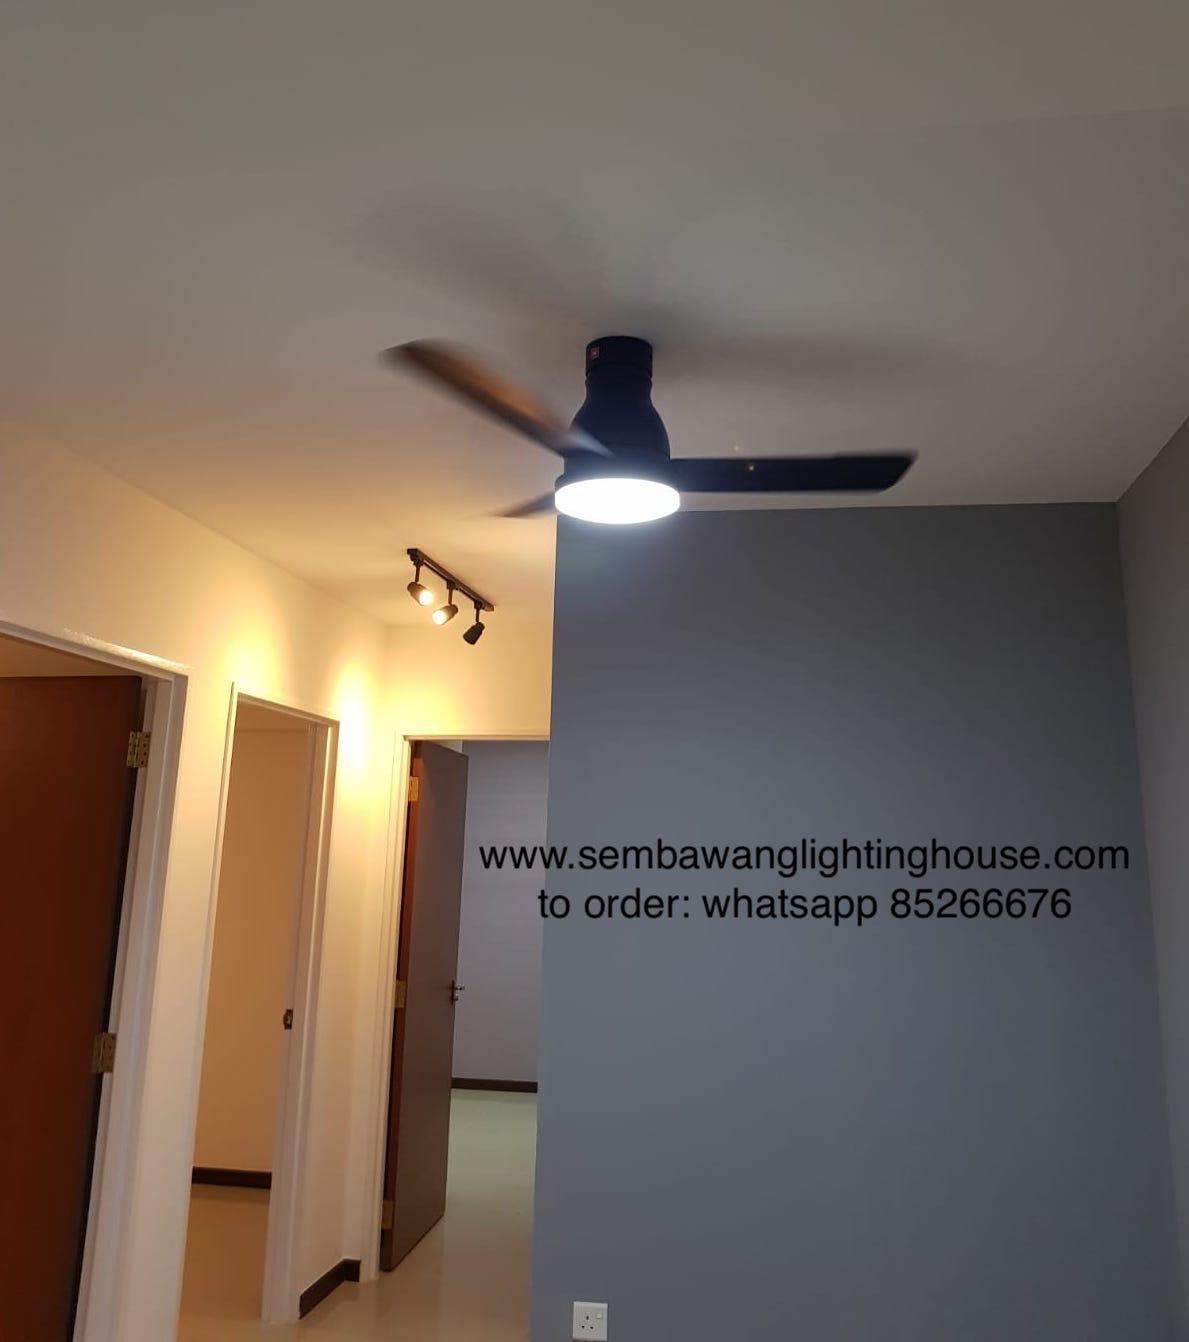 kdk-u48fp-sample-sembawang-lighting-house-15.jpg